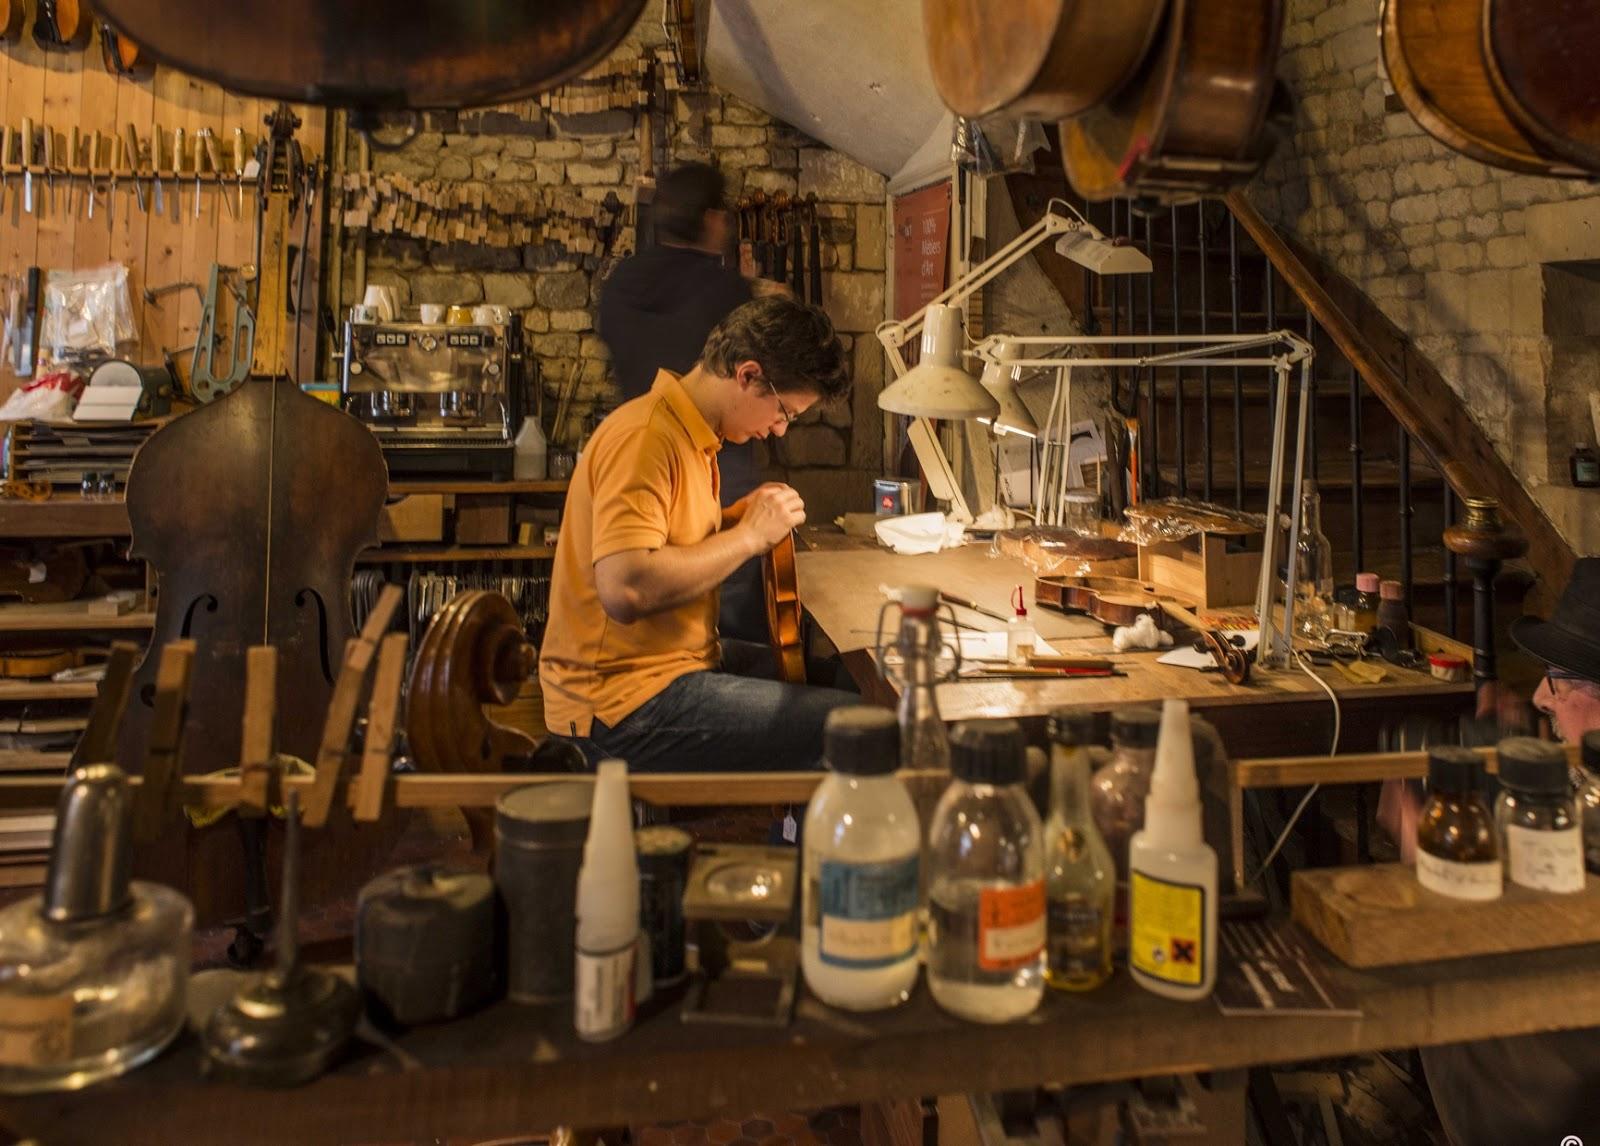 luthier ile ilgili görsel sonucu